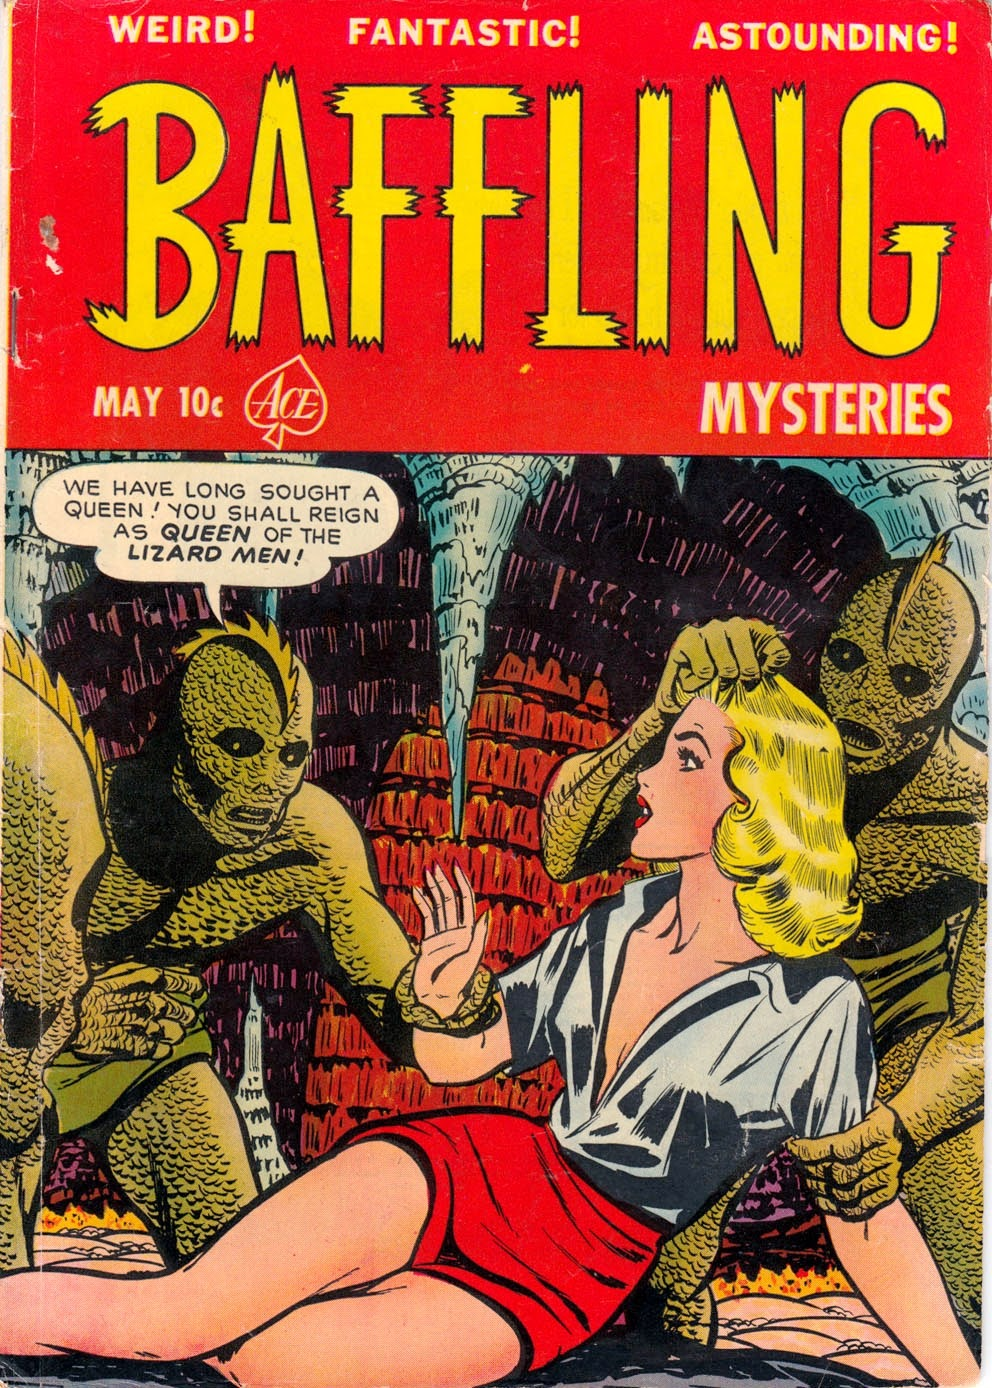 Baffling Mysteries!